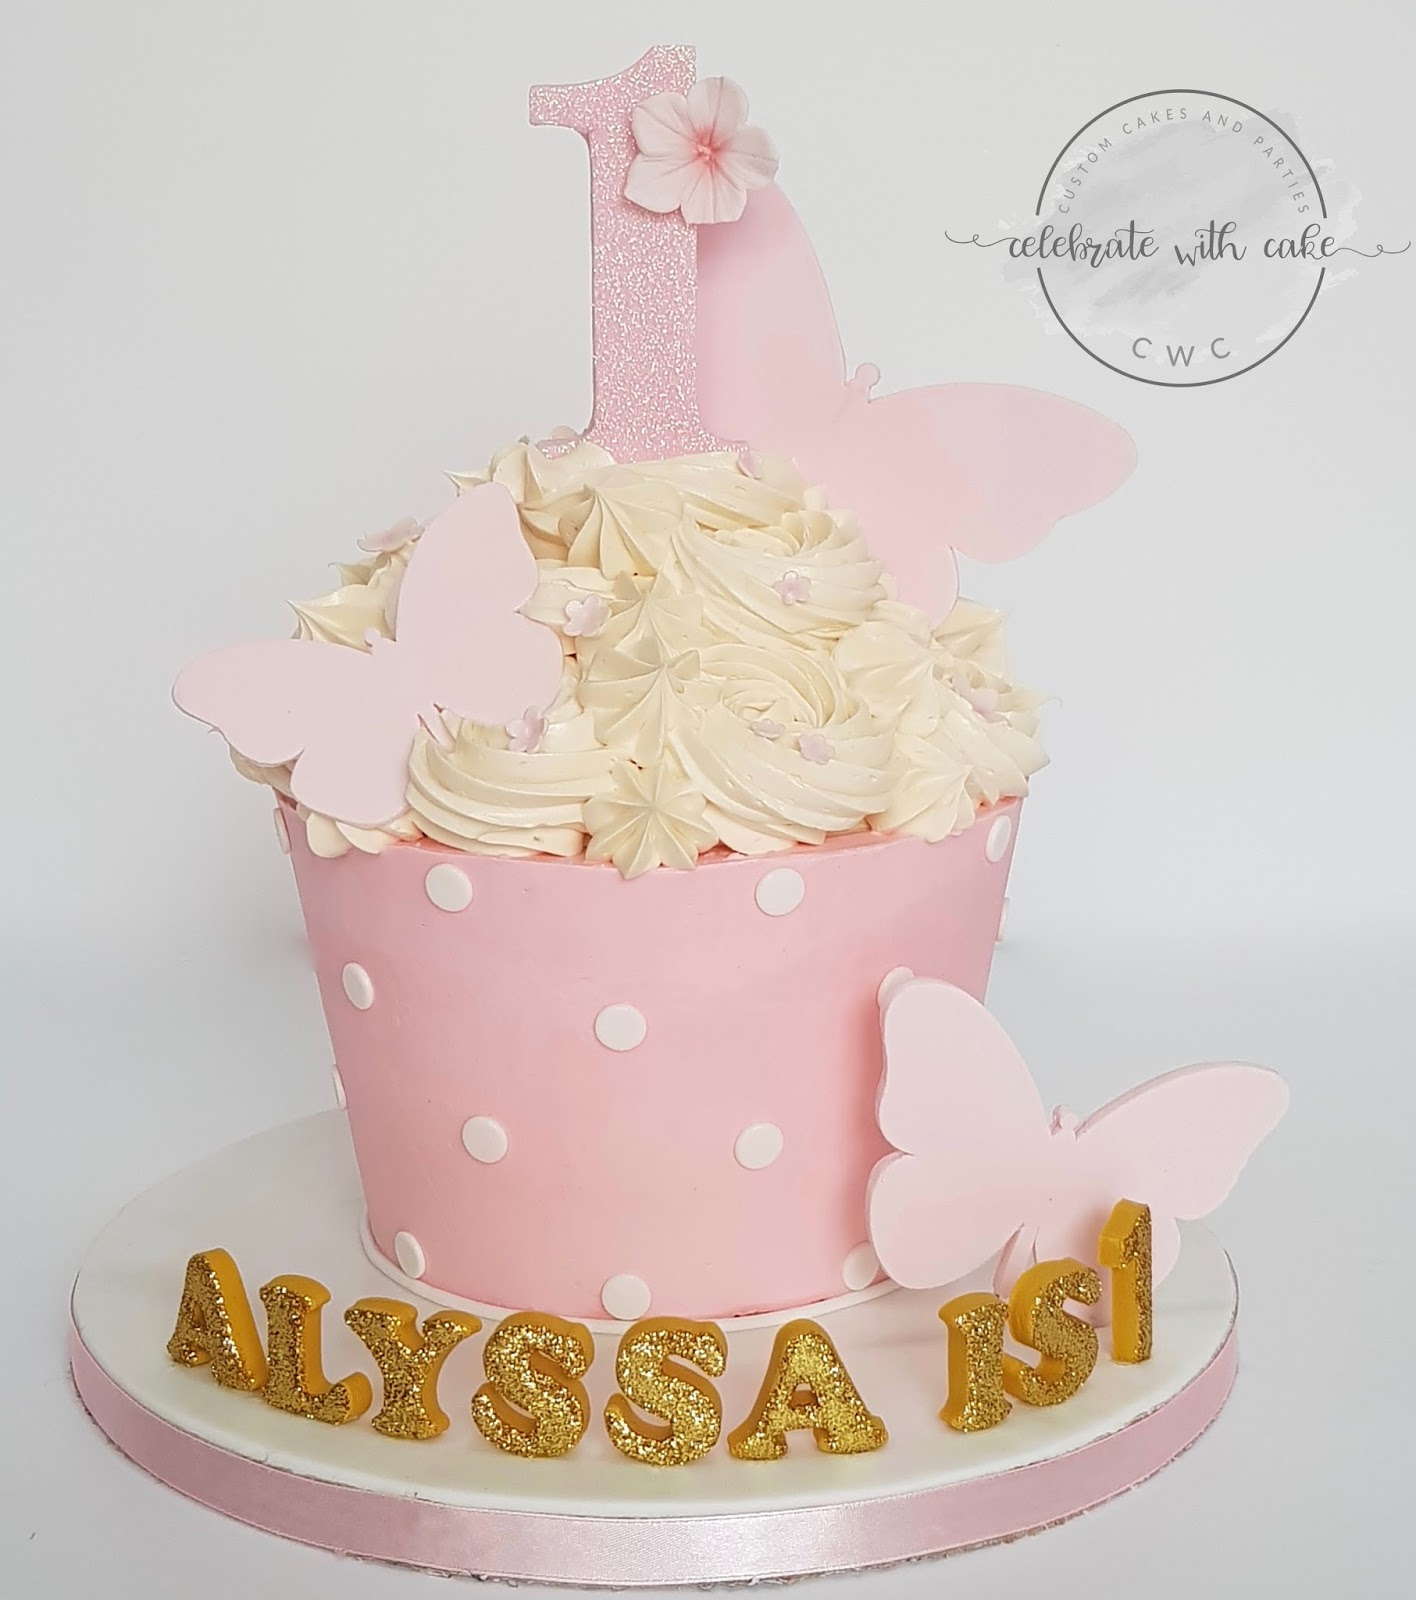 Astounding Celebrate With Cake 1St Birthday Giant Cupcake Smash Cake Funny Birthday Cards Online Necthendildamsfinfo